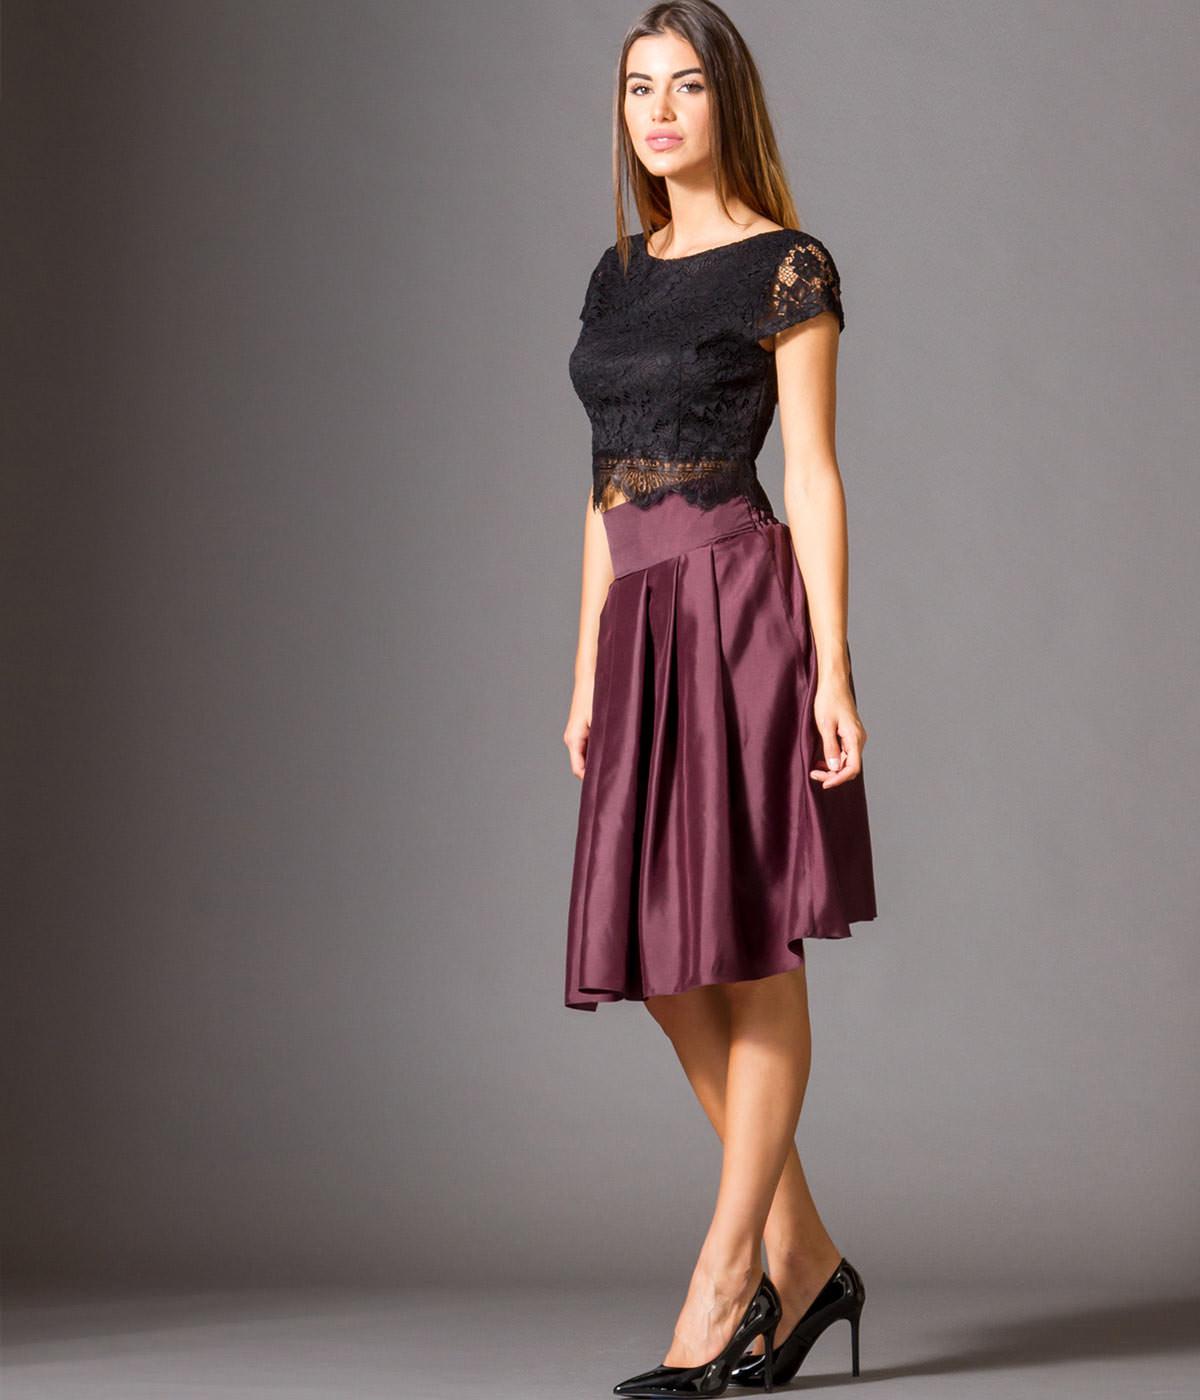 003e89bdce45 Μία midi φούστα σε έντονο χρώμα που θα ταιριάξετε με μια εφαρμοστή μπλούζα  ή πουκάμισο